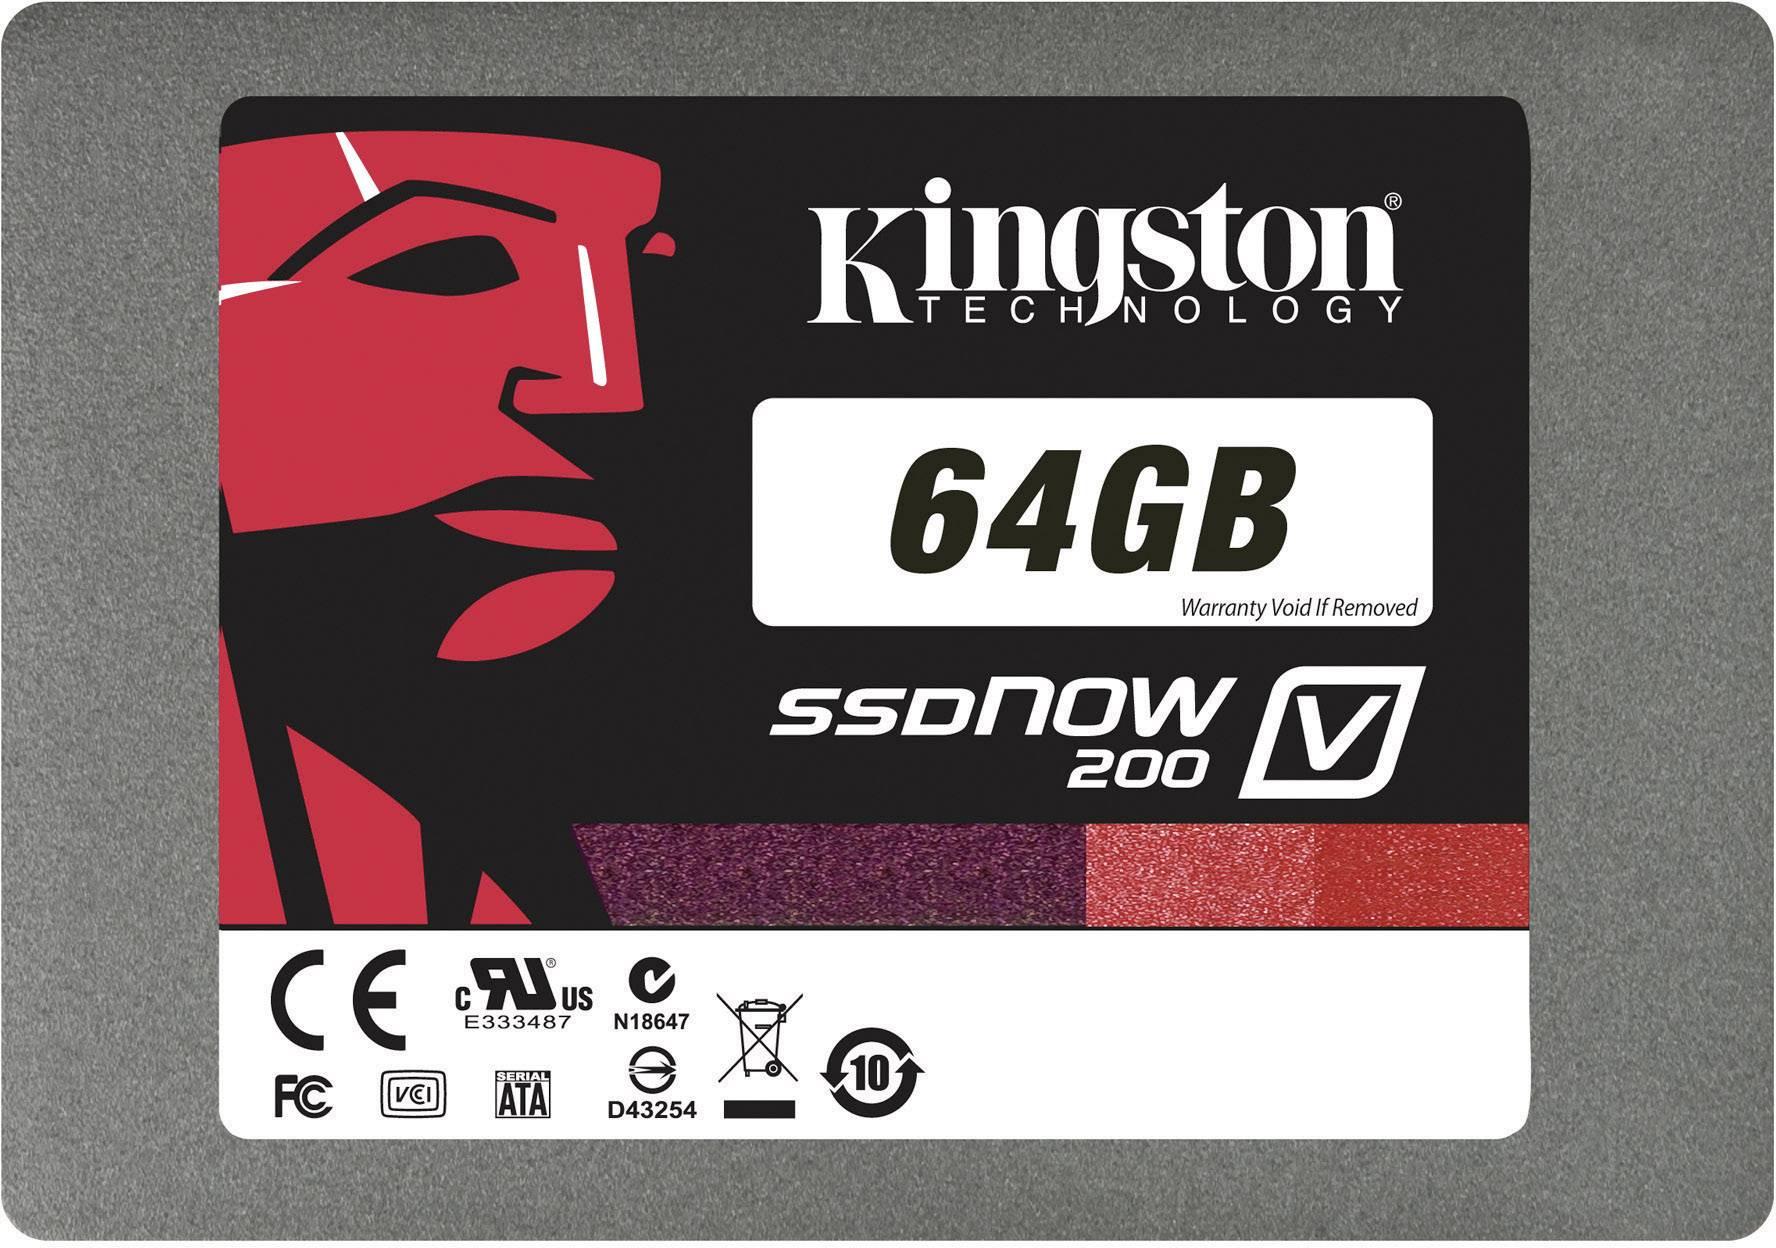 Kingston SV200S3D7/64G SSD Drivers for Mac